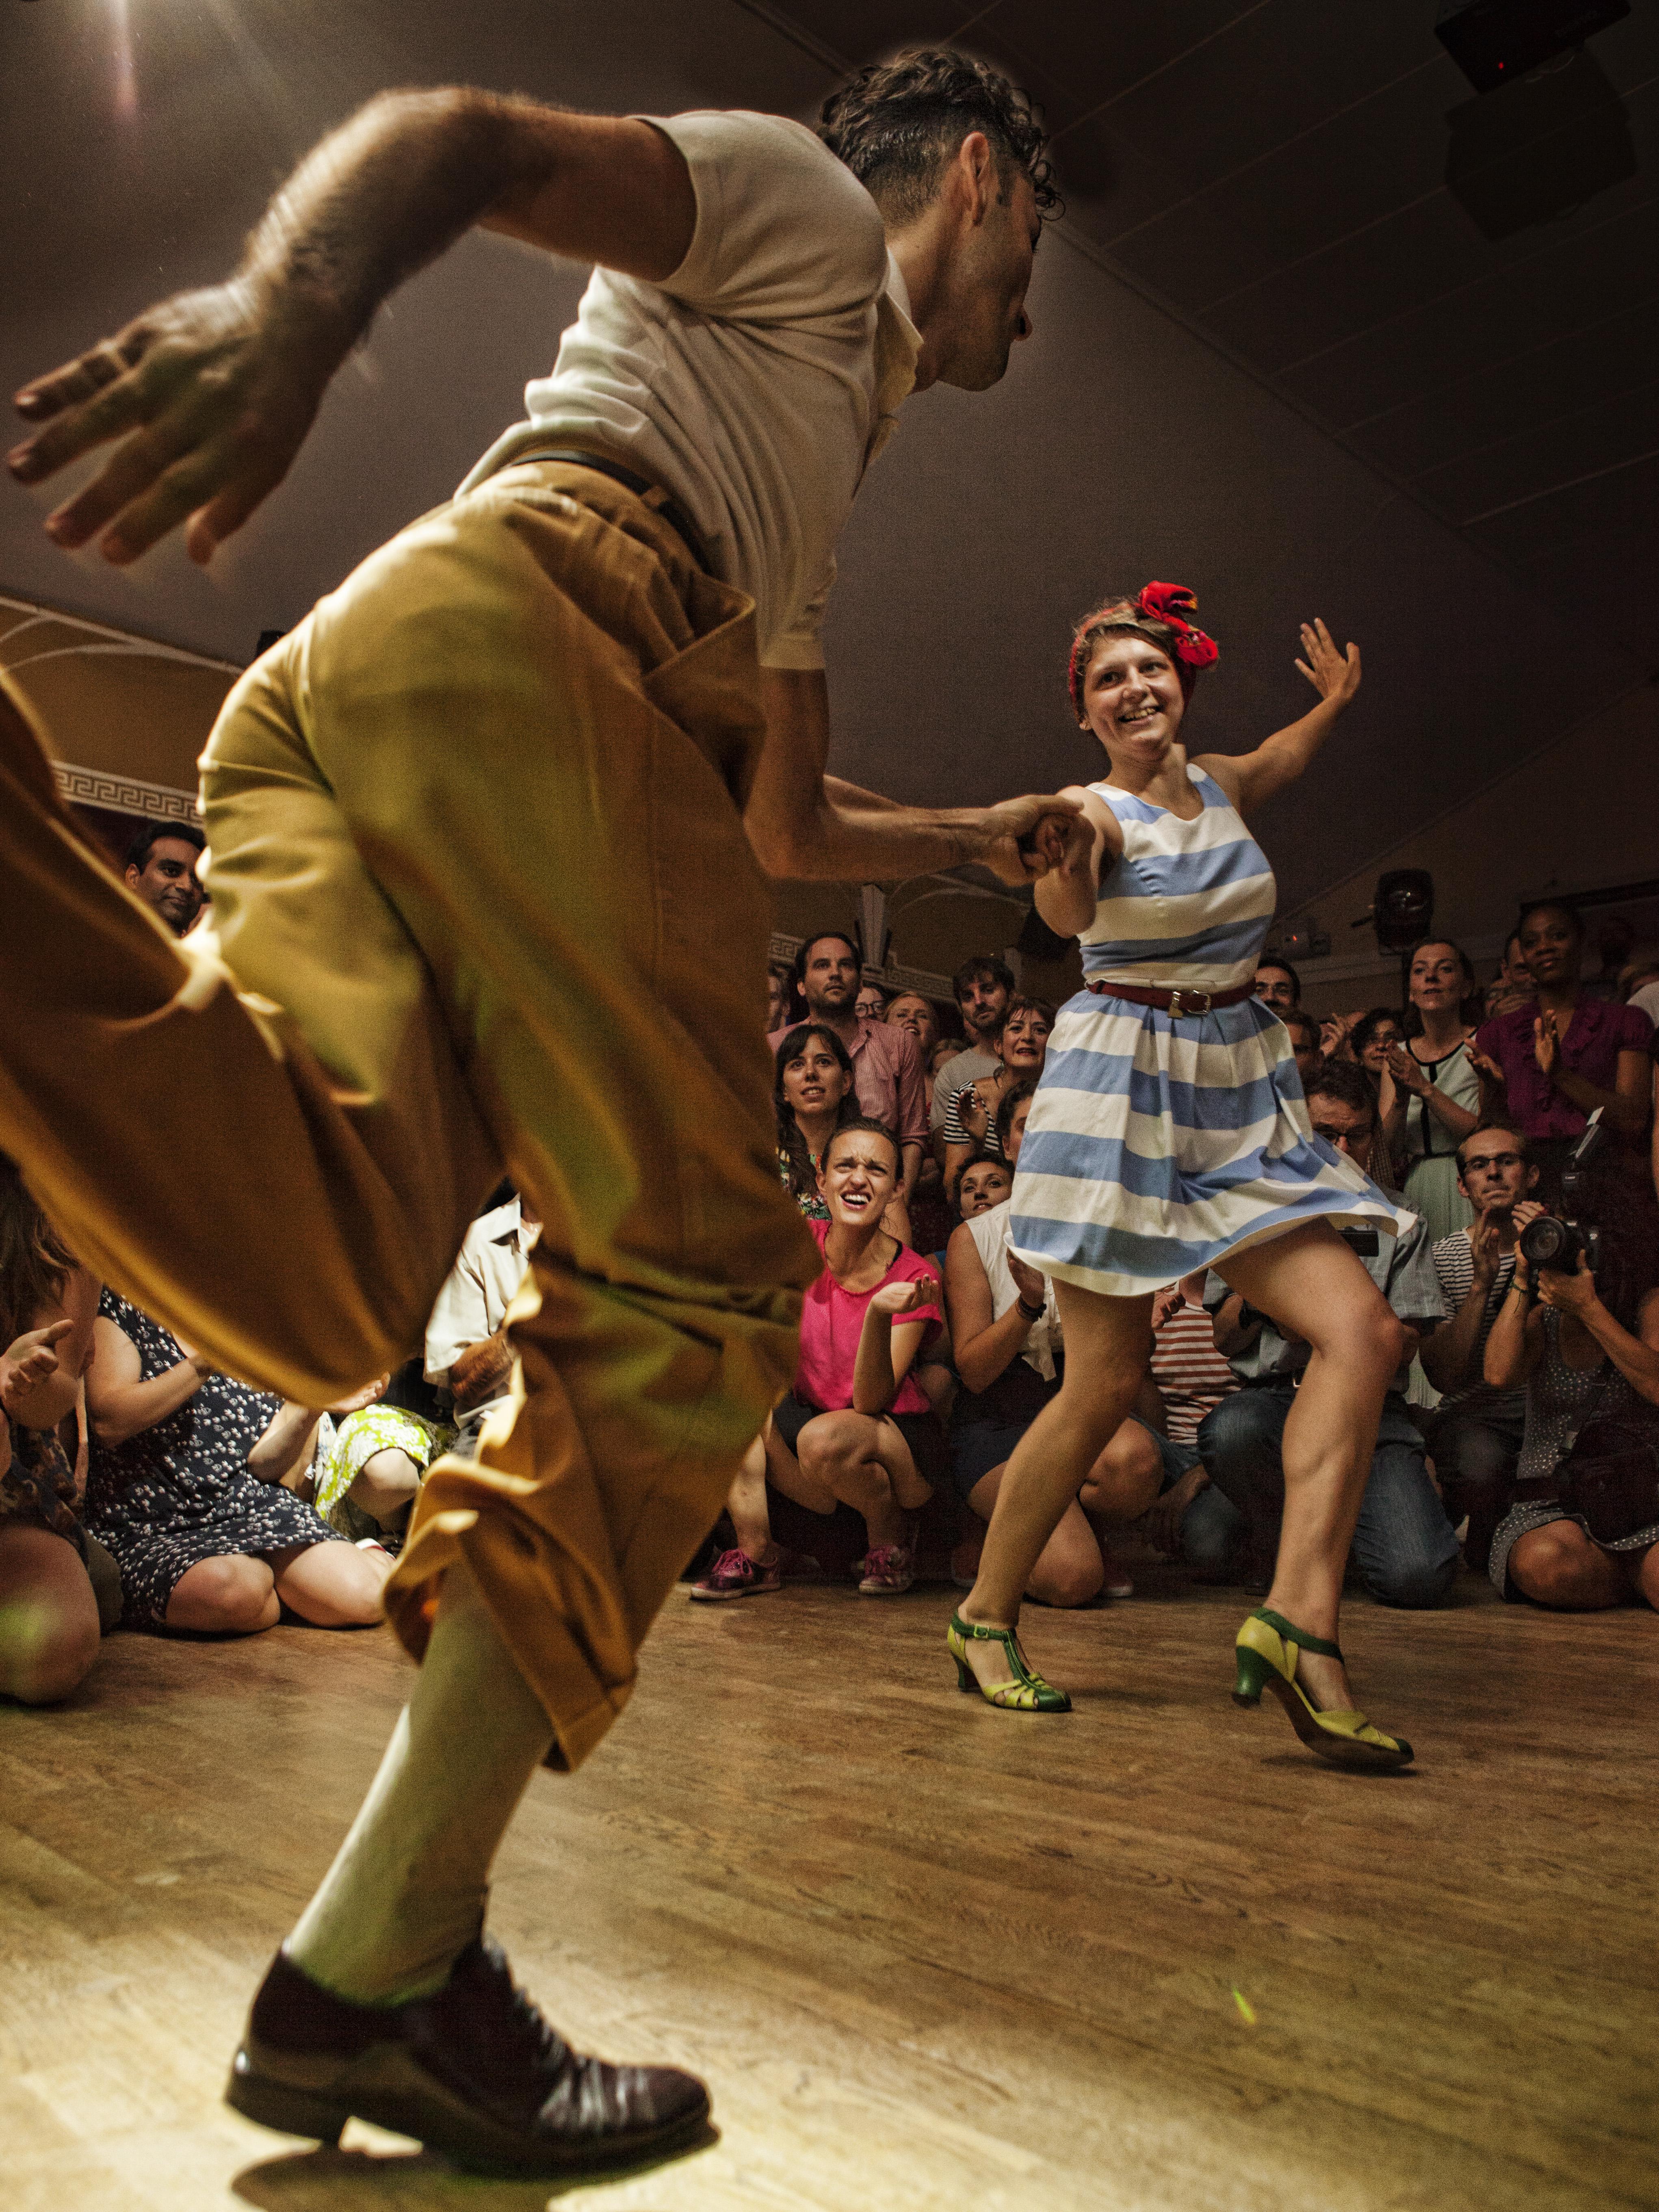 Herräng Dance Camp 2014, Suède